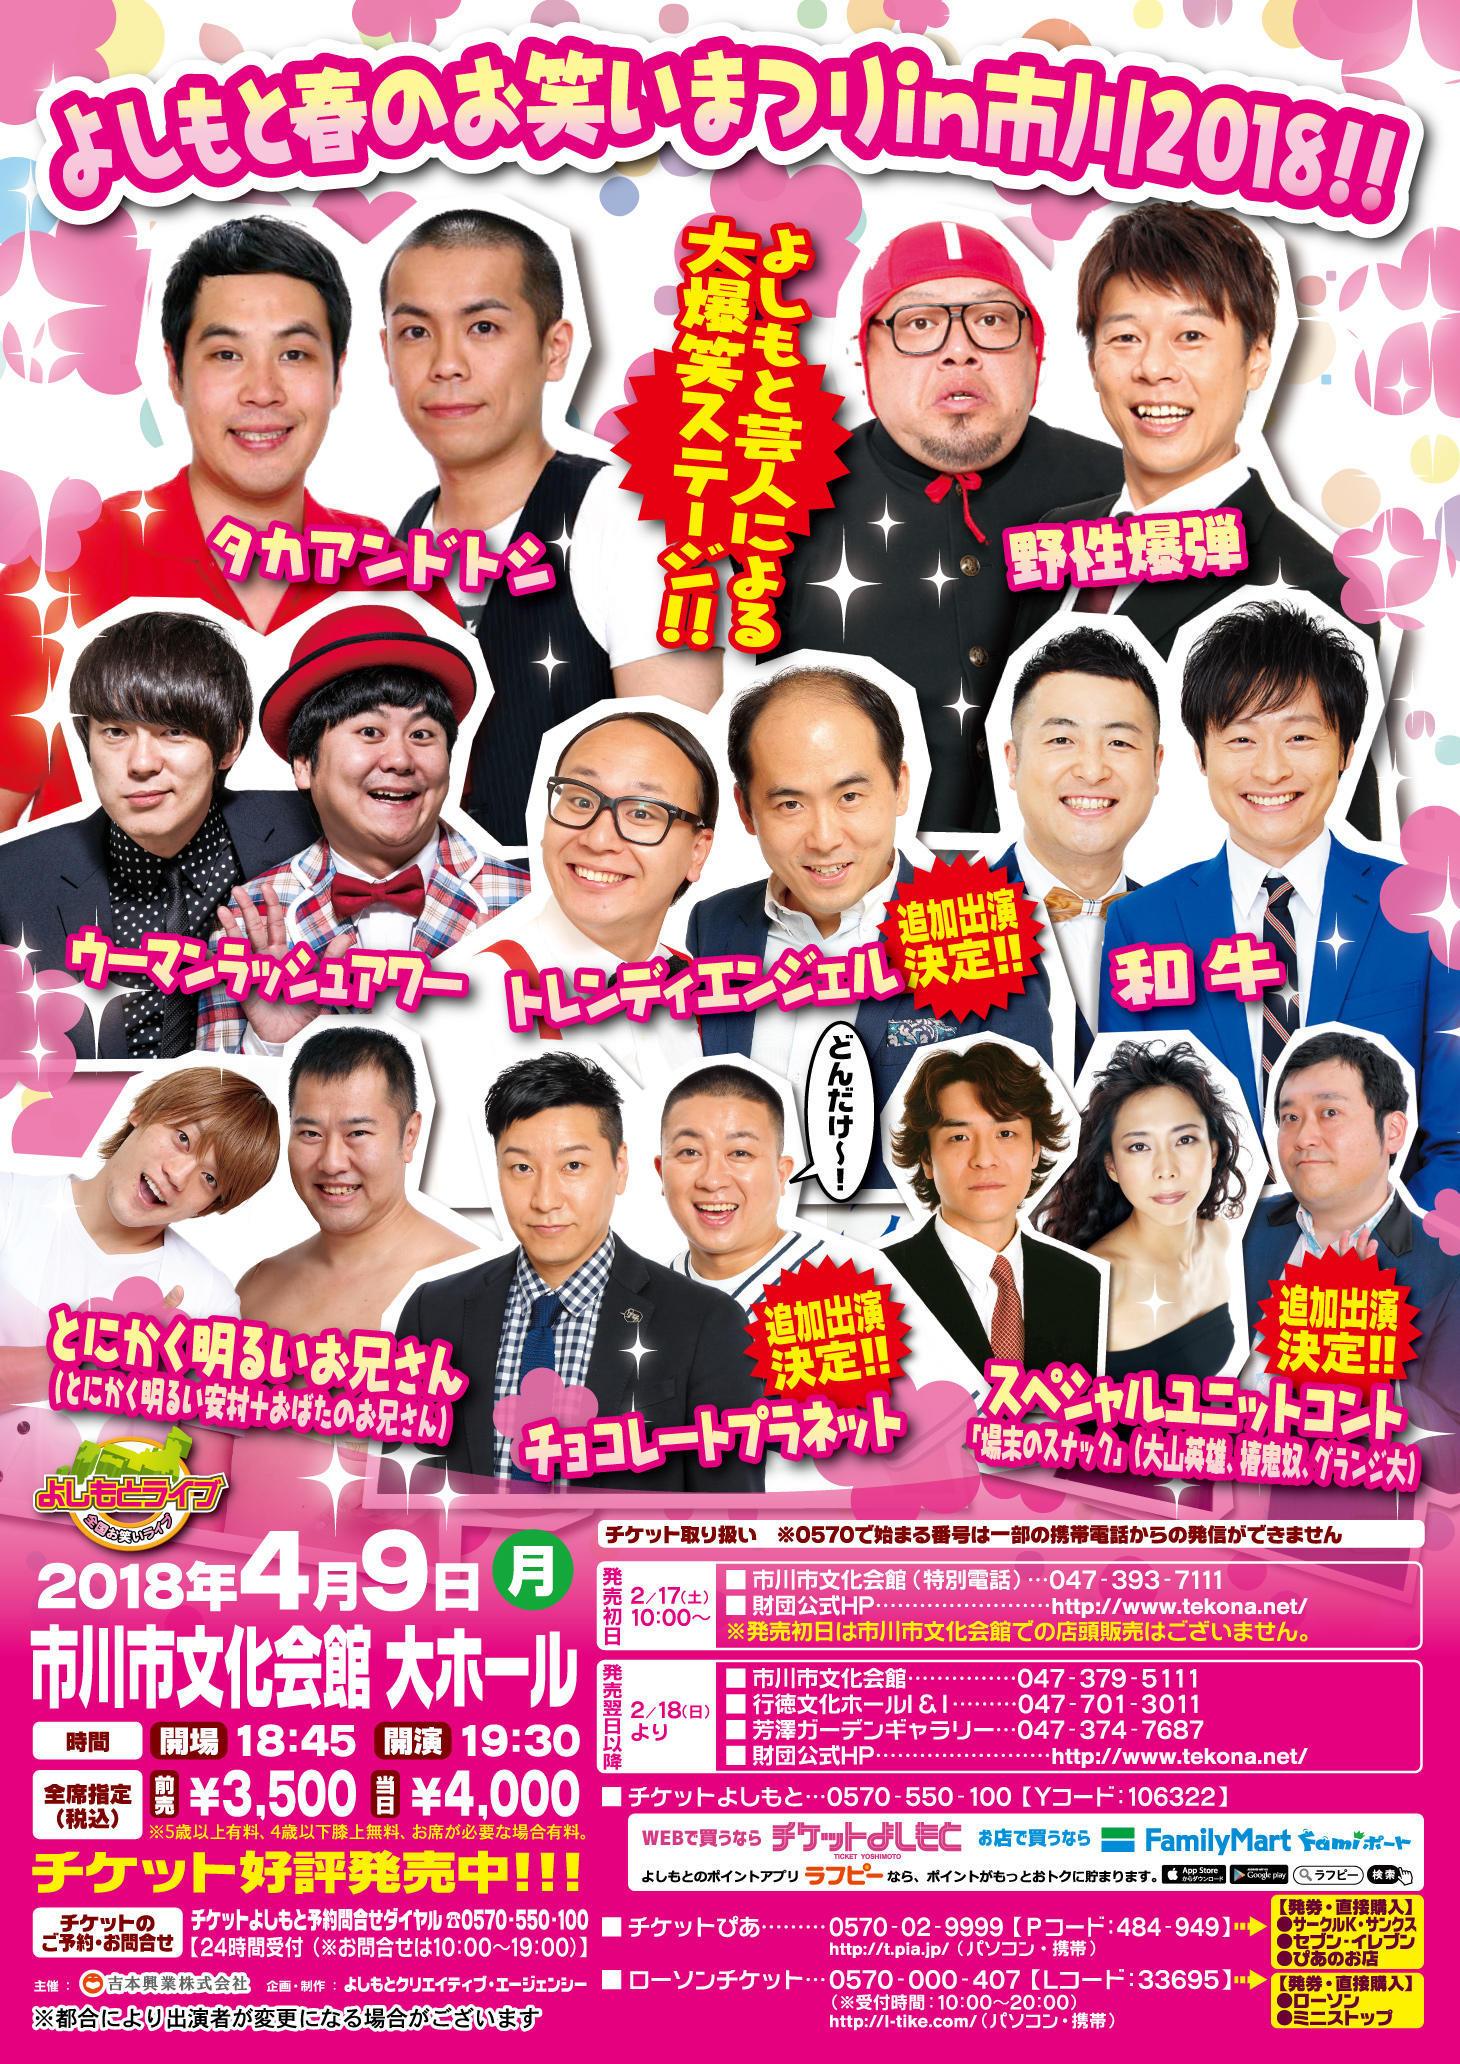 http://www.syumatsu.jp/20180303234036-effa1ba860fc85c82e4d604bc681aeefb25562db.jpg